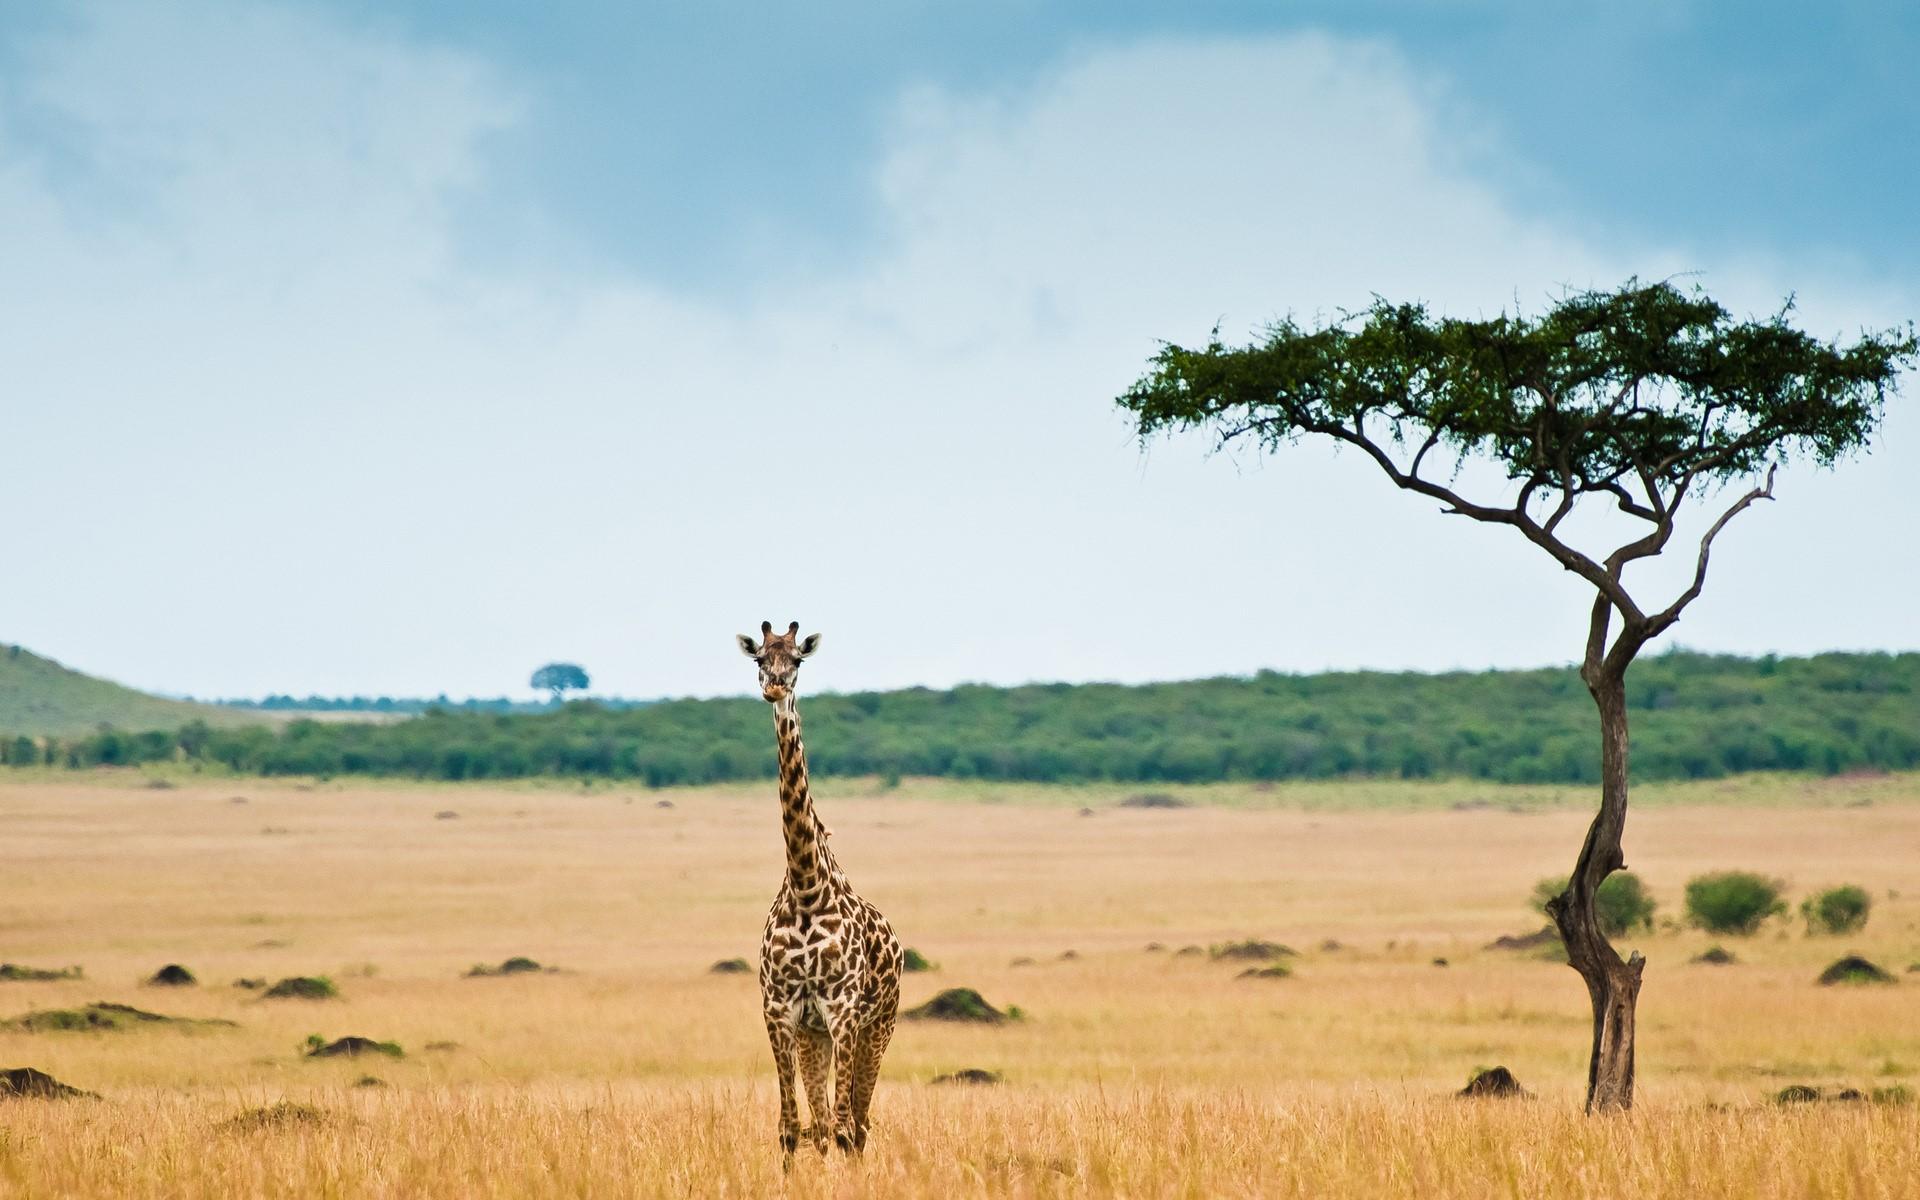 Giraffe HQ